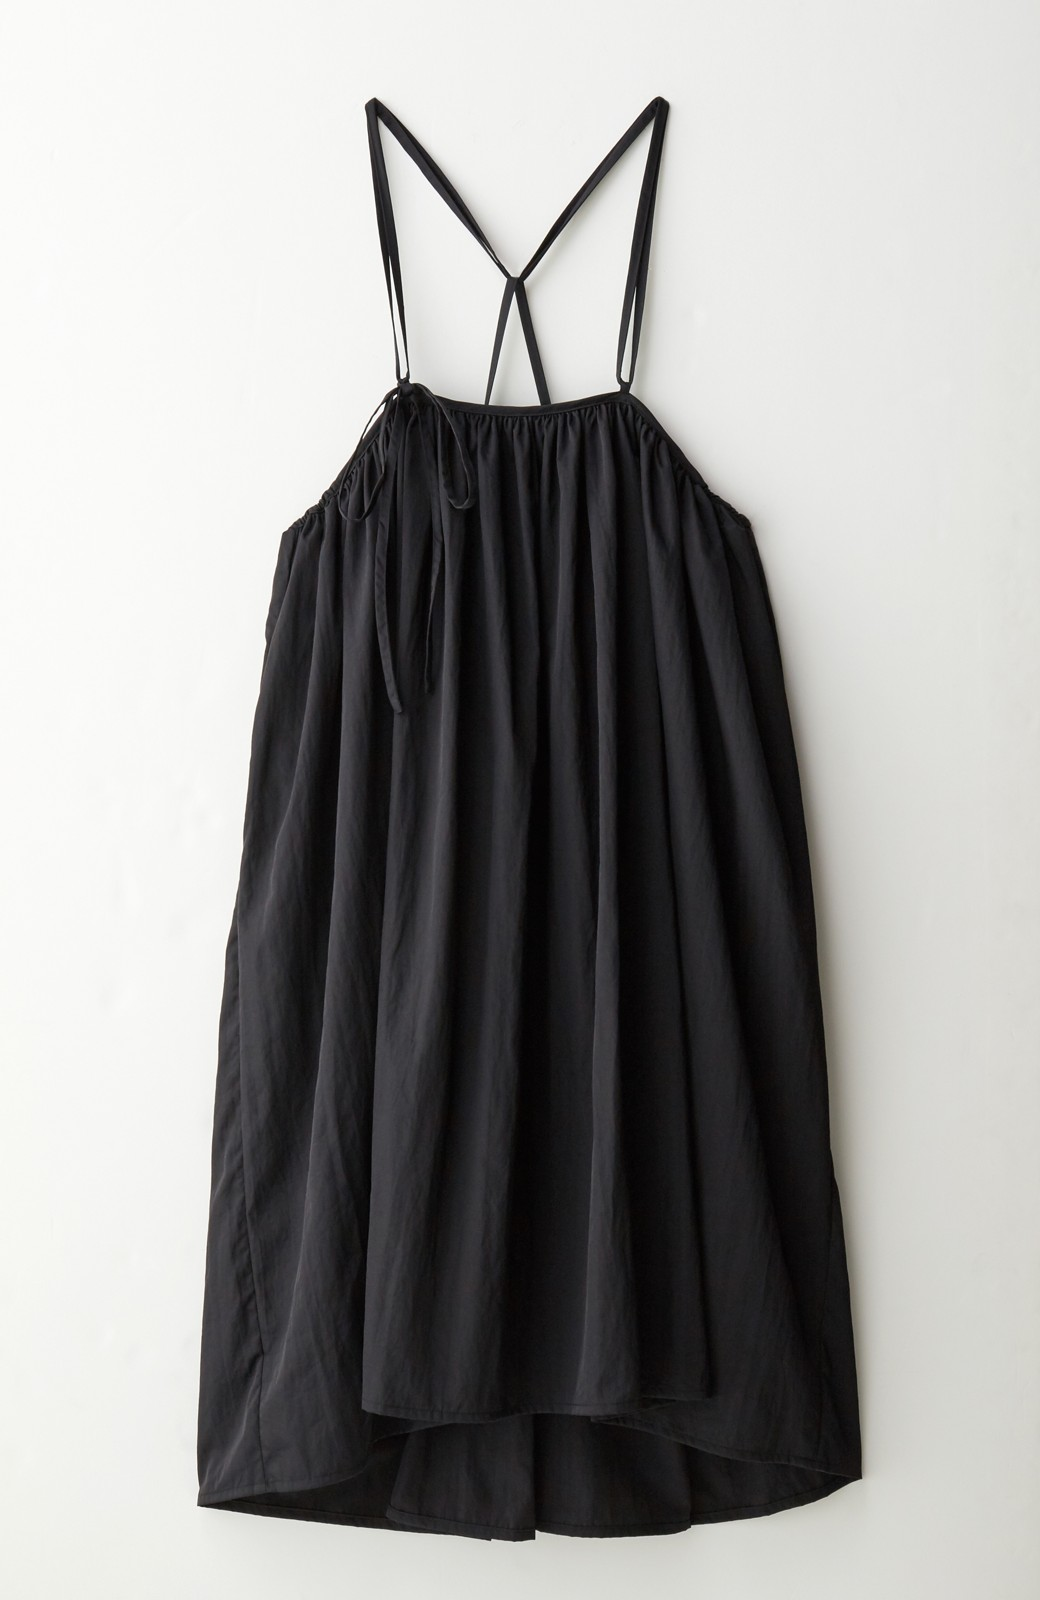 haco! 女の子バンザイ!プロジェクト【ブルー期】 ニットですら重ね着できる安心さ ゆったりギャザーキャミワンピ <ブラック>の商品写真6